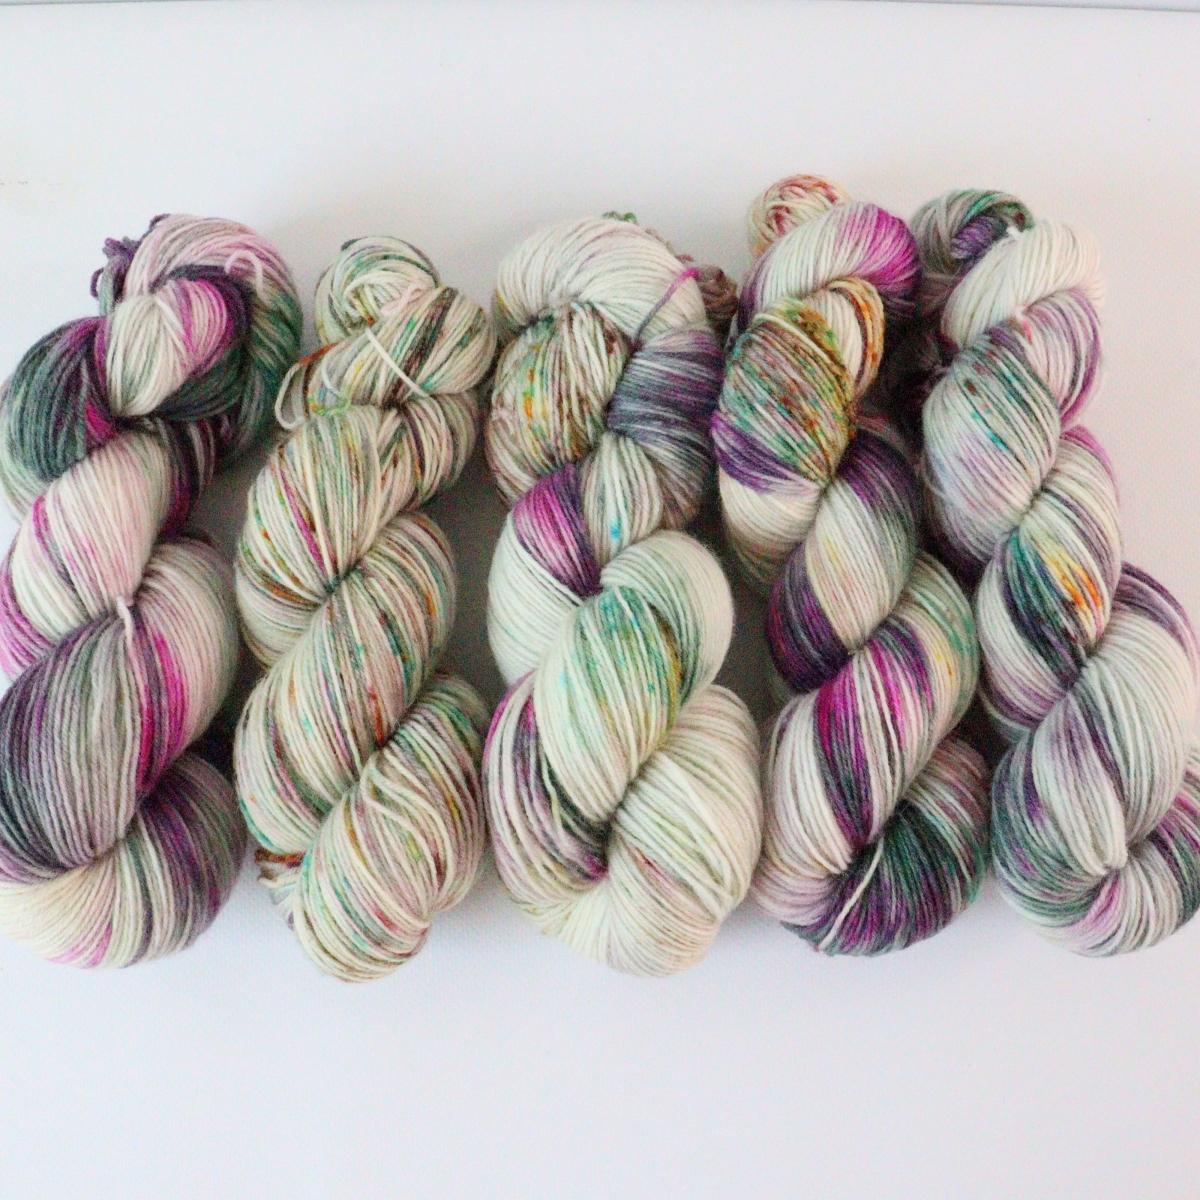 woodico.pro hand dyed yarn 079 2 1200x1200 - Hand dyed yarn / 079